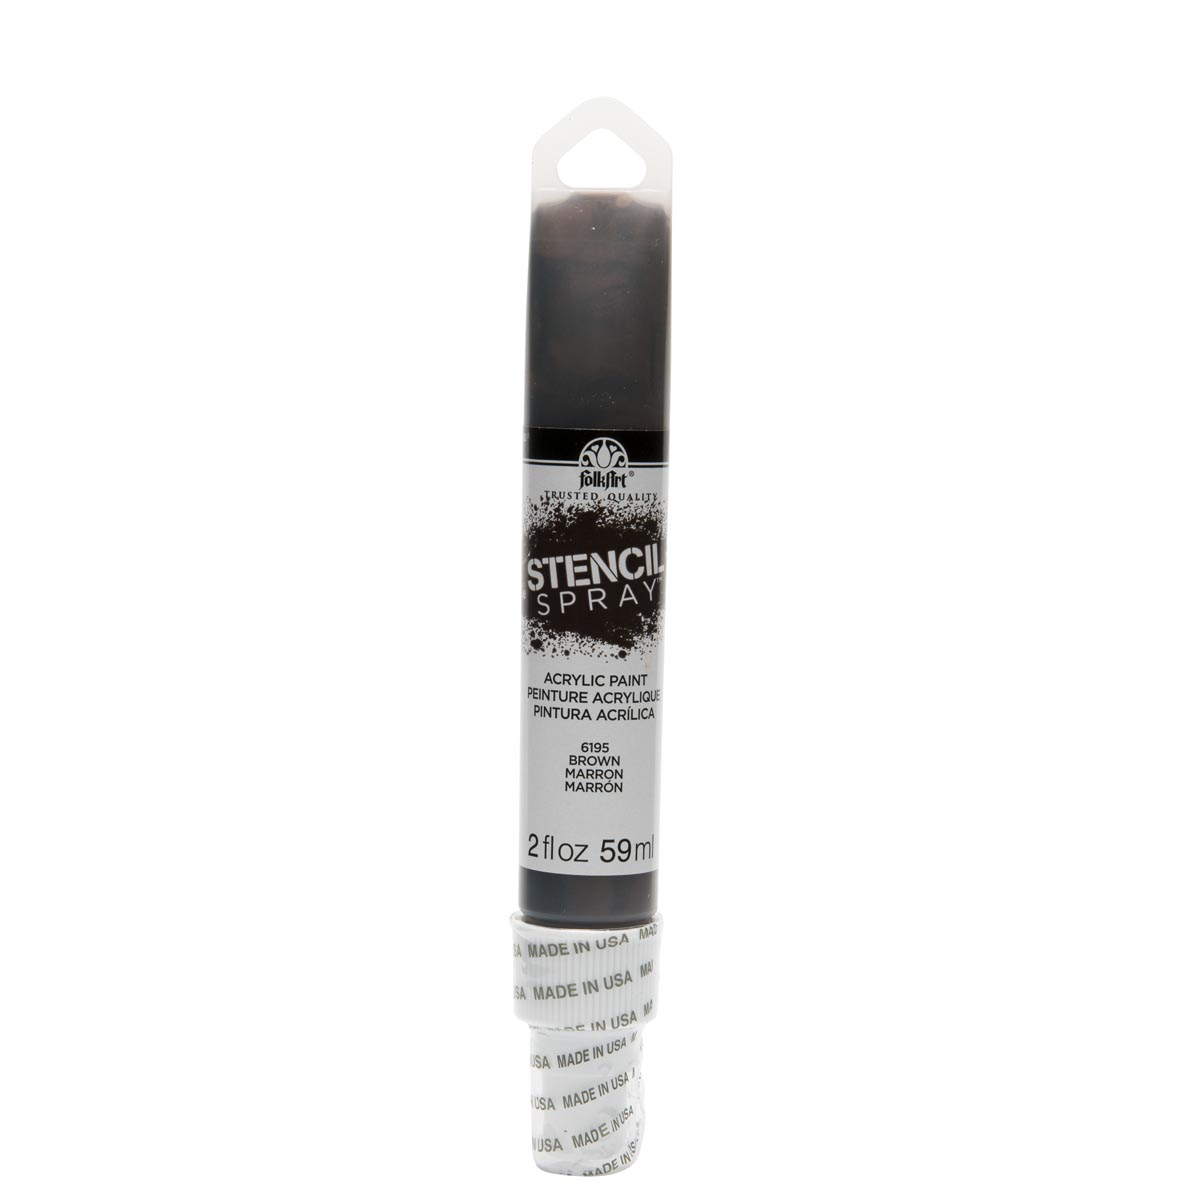 FolkArt ® Stencil Spray™ Acrylic Paint - Brown, 2 oz.